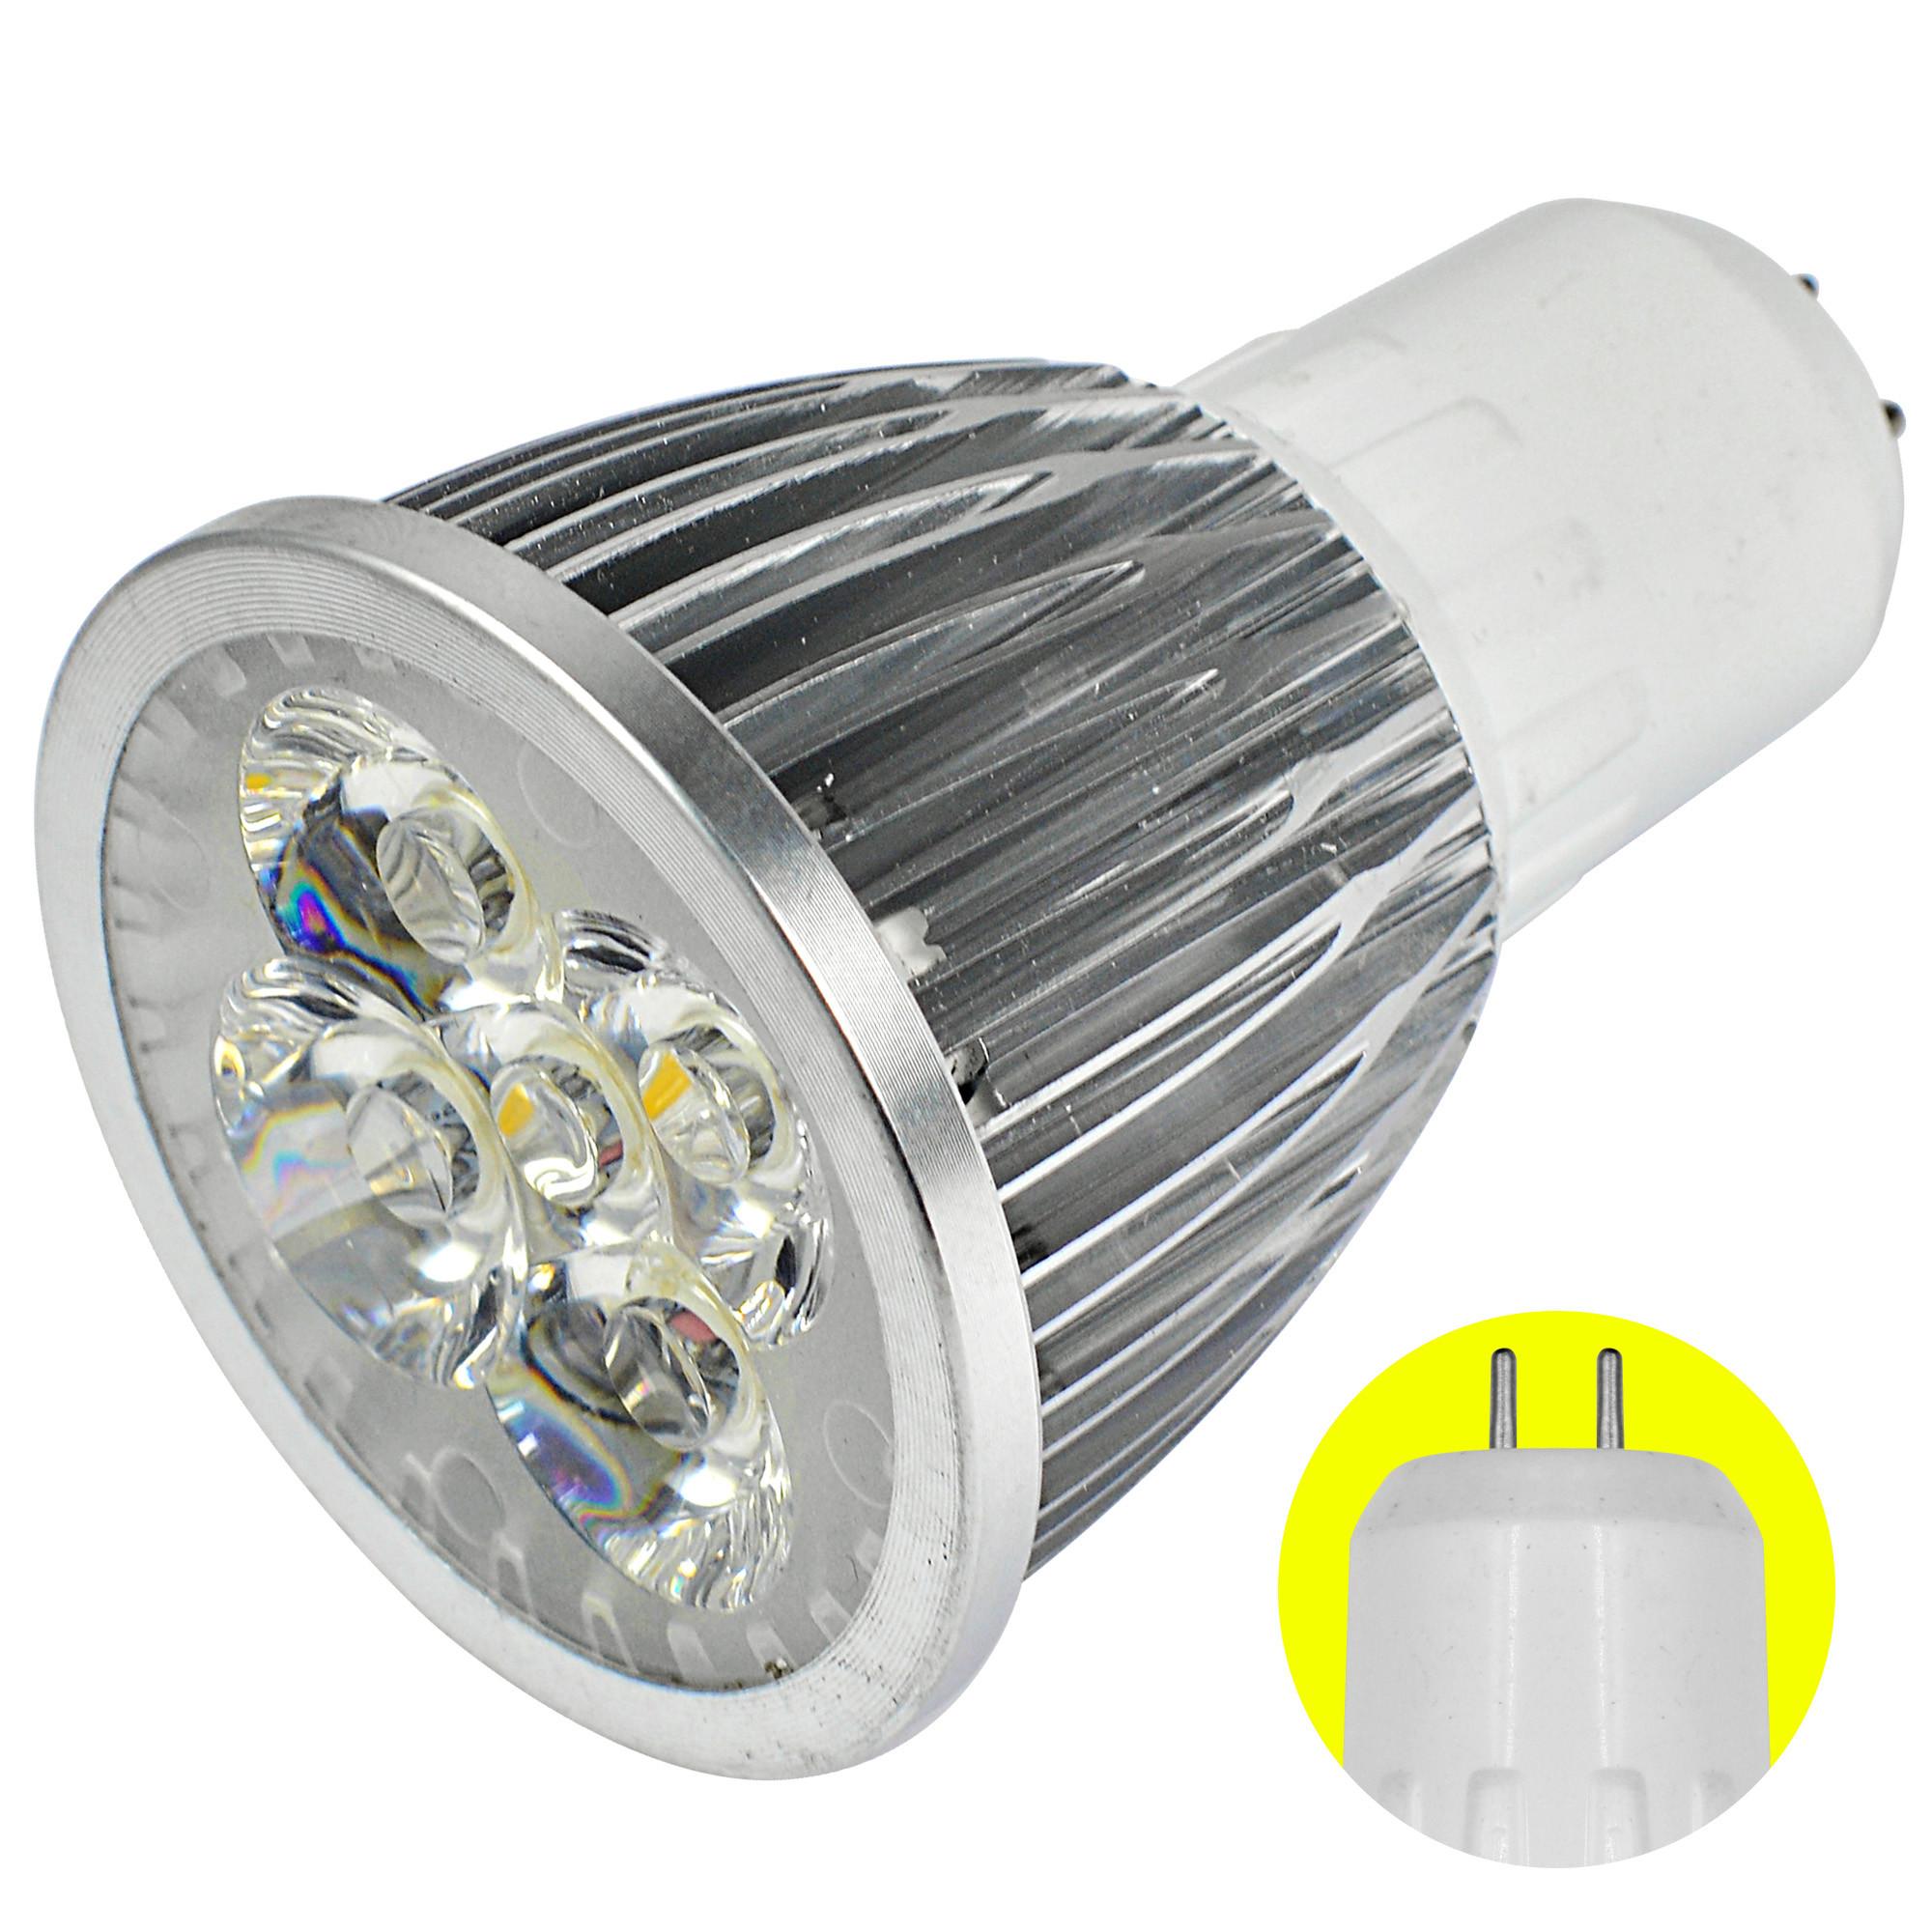 GU5.3 5W LED Spotlight SMD LEDs LED Lamp Bulb in Warm White Energy ...